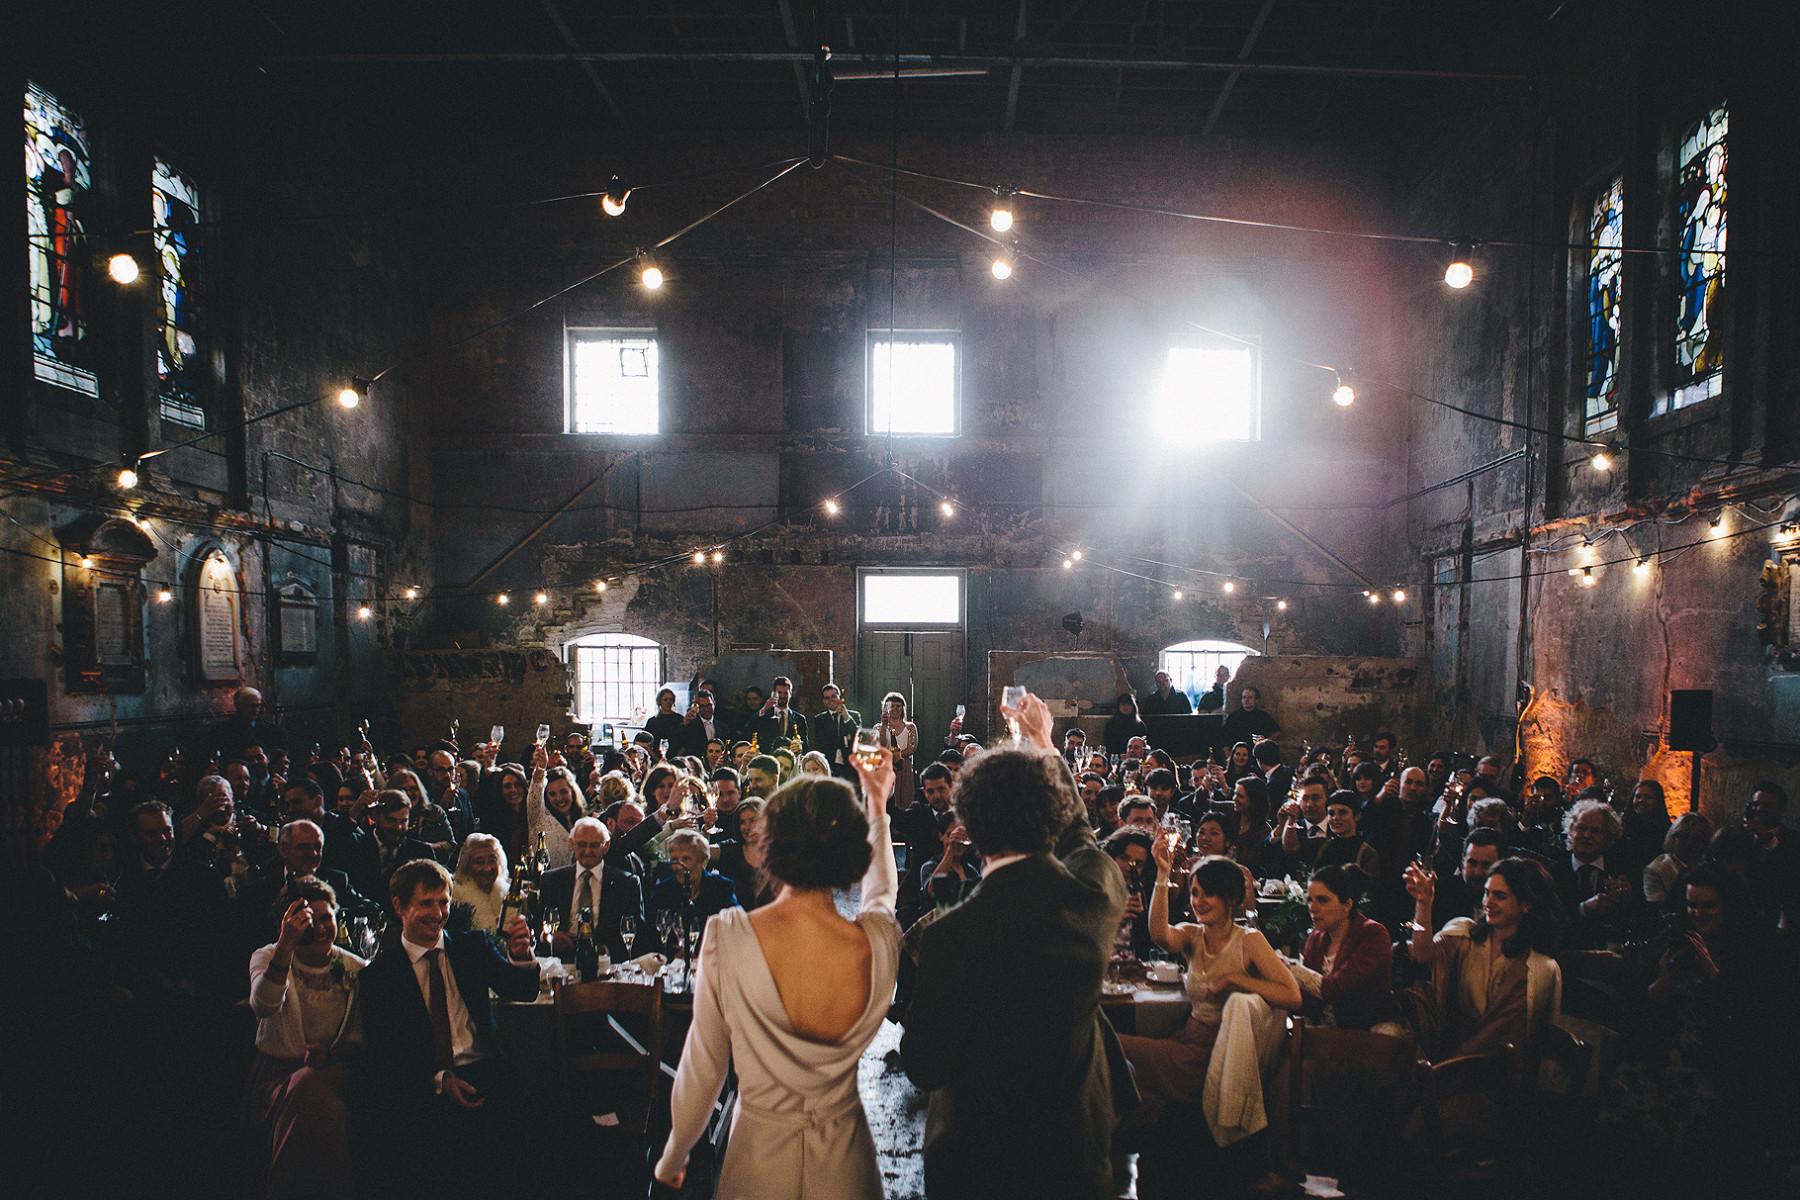 wedding_the_asylum_peckham_-1-1800x1200.jpg